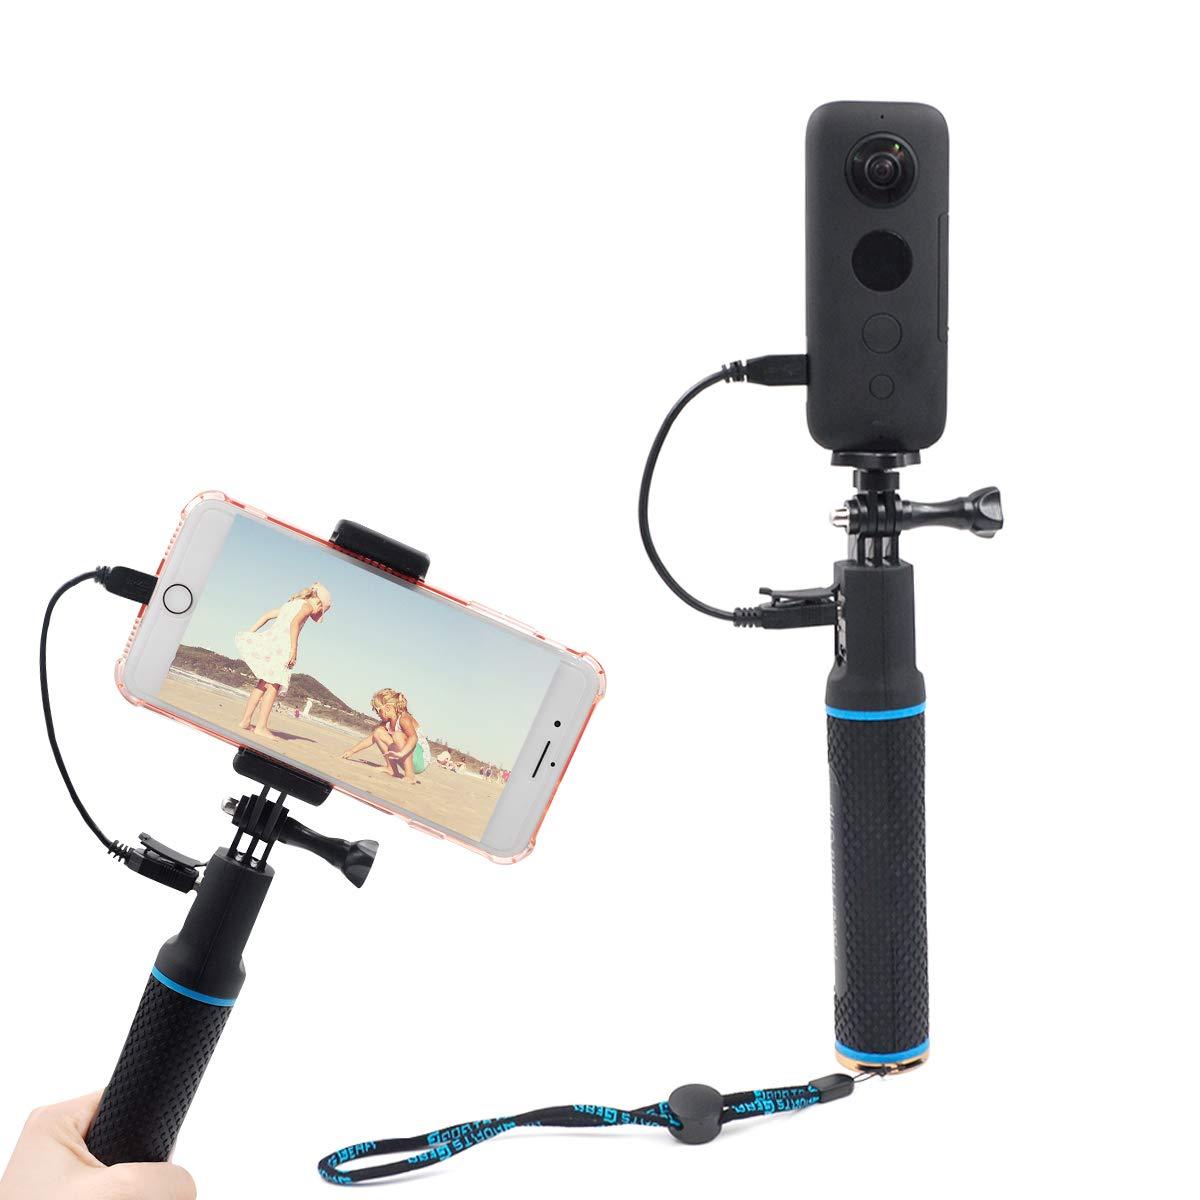 STARTRC Sport Camera Selfie Stick,Handheld Portable Charging Treasure Power Selfie Stick for Insta360 ONE X/EVO